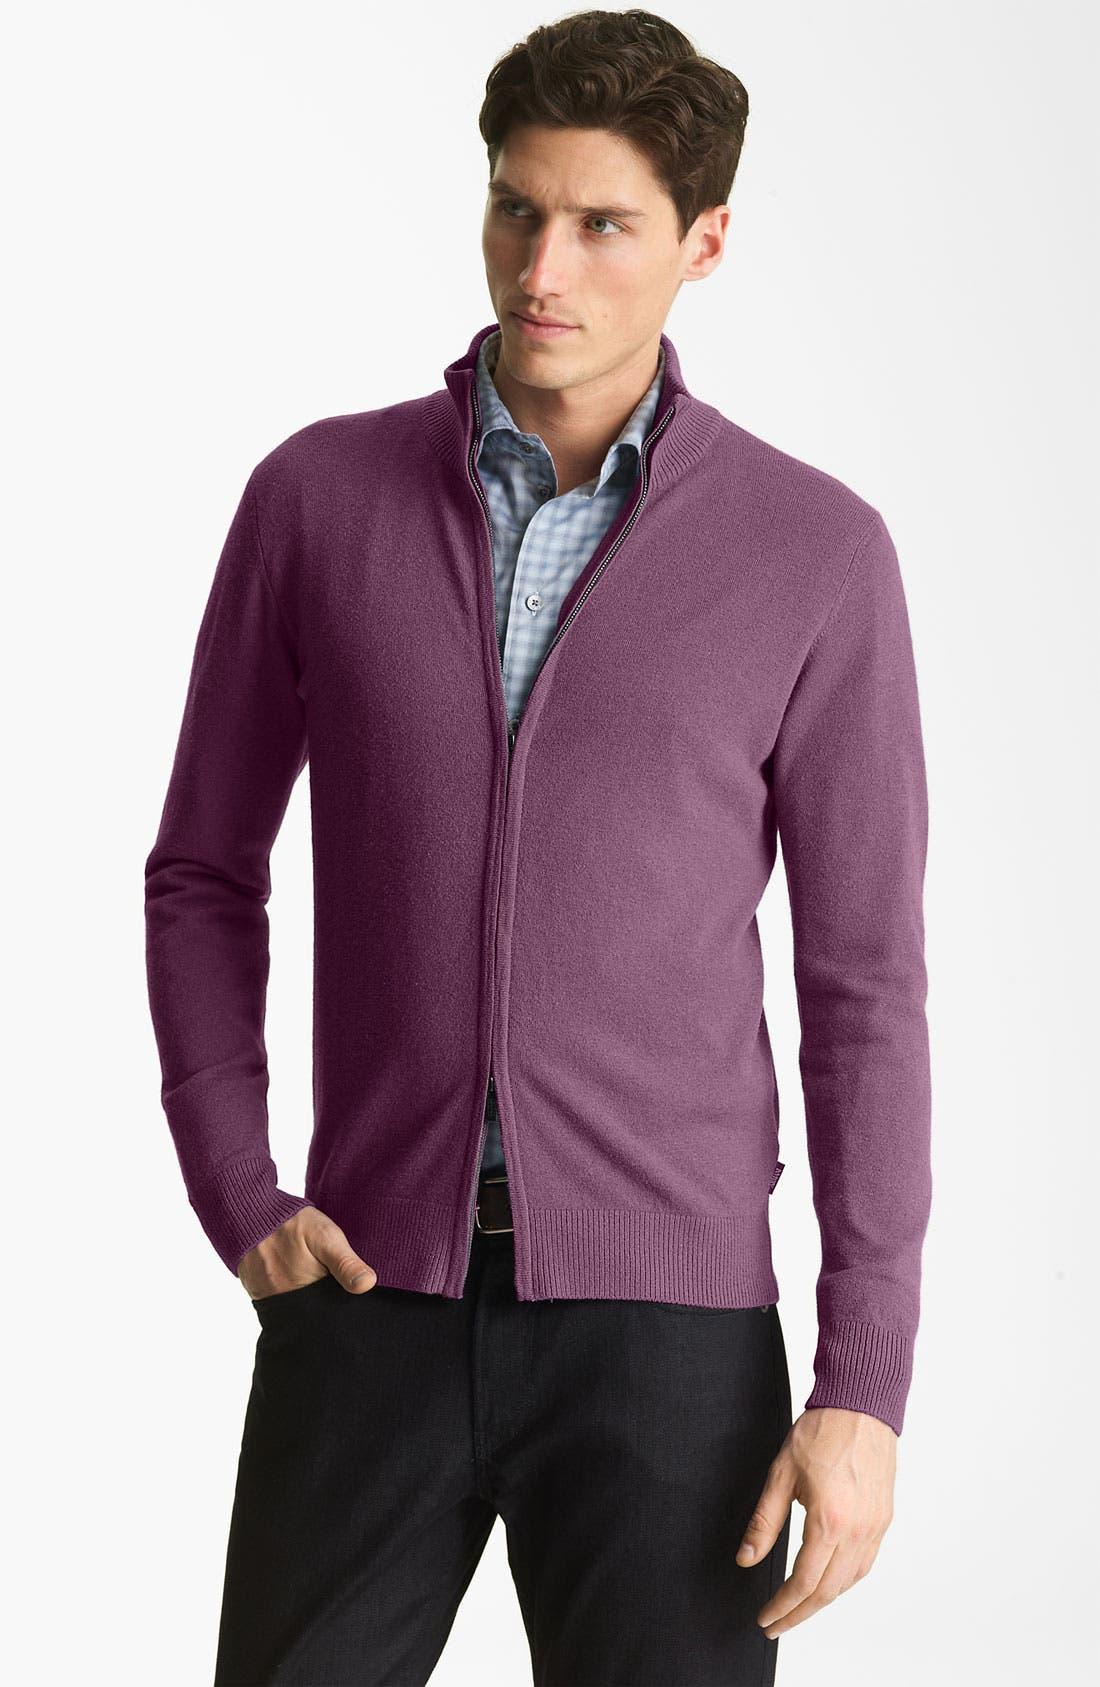 Alternate Image 1 Selected - Armani Collezioni Zip Sweater